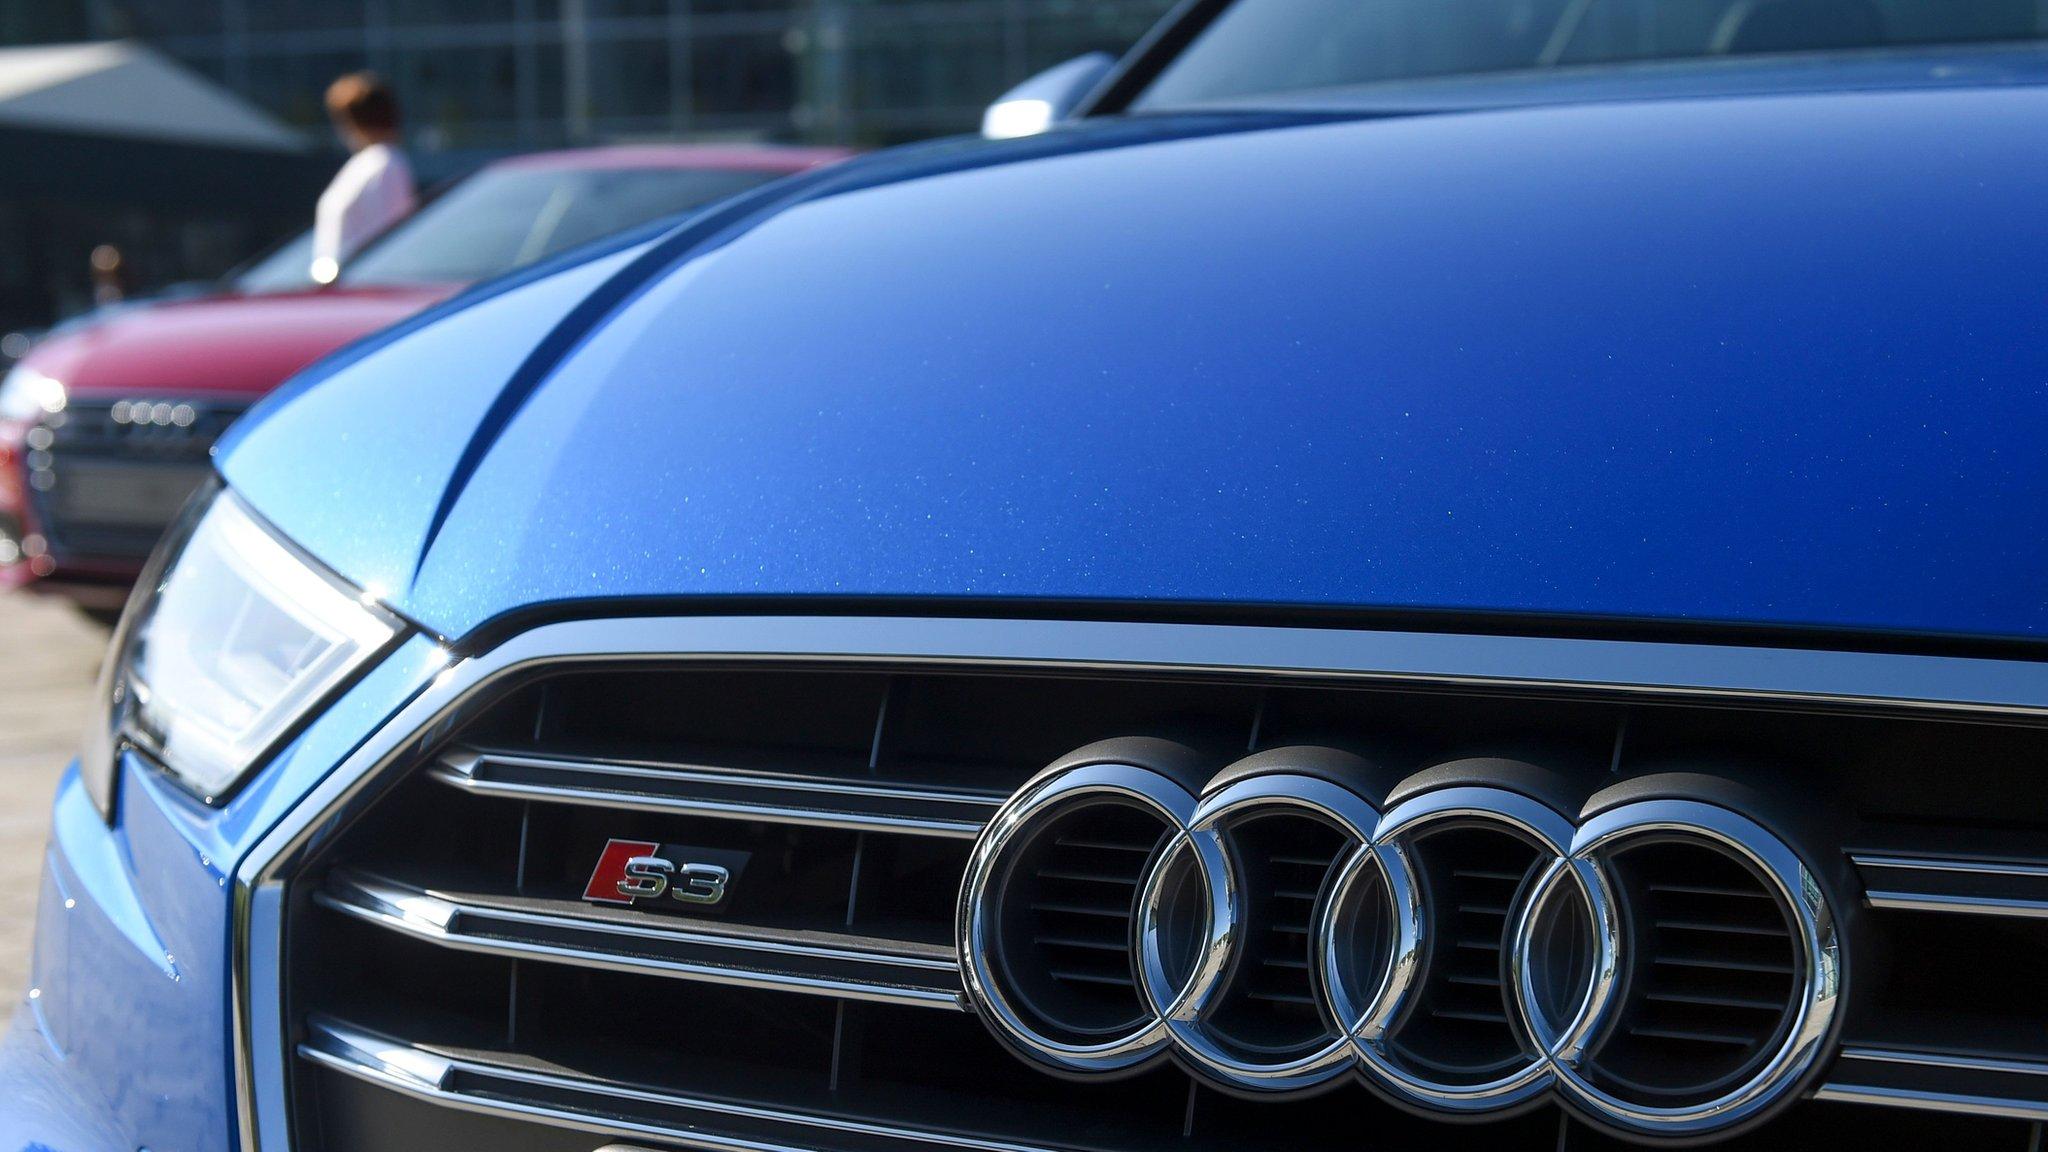 Керівника Audi Руперта Штадлера арештували через